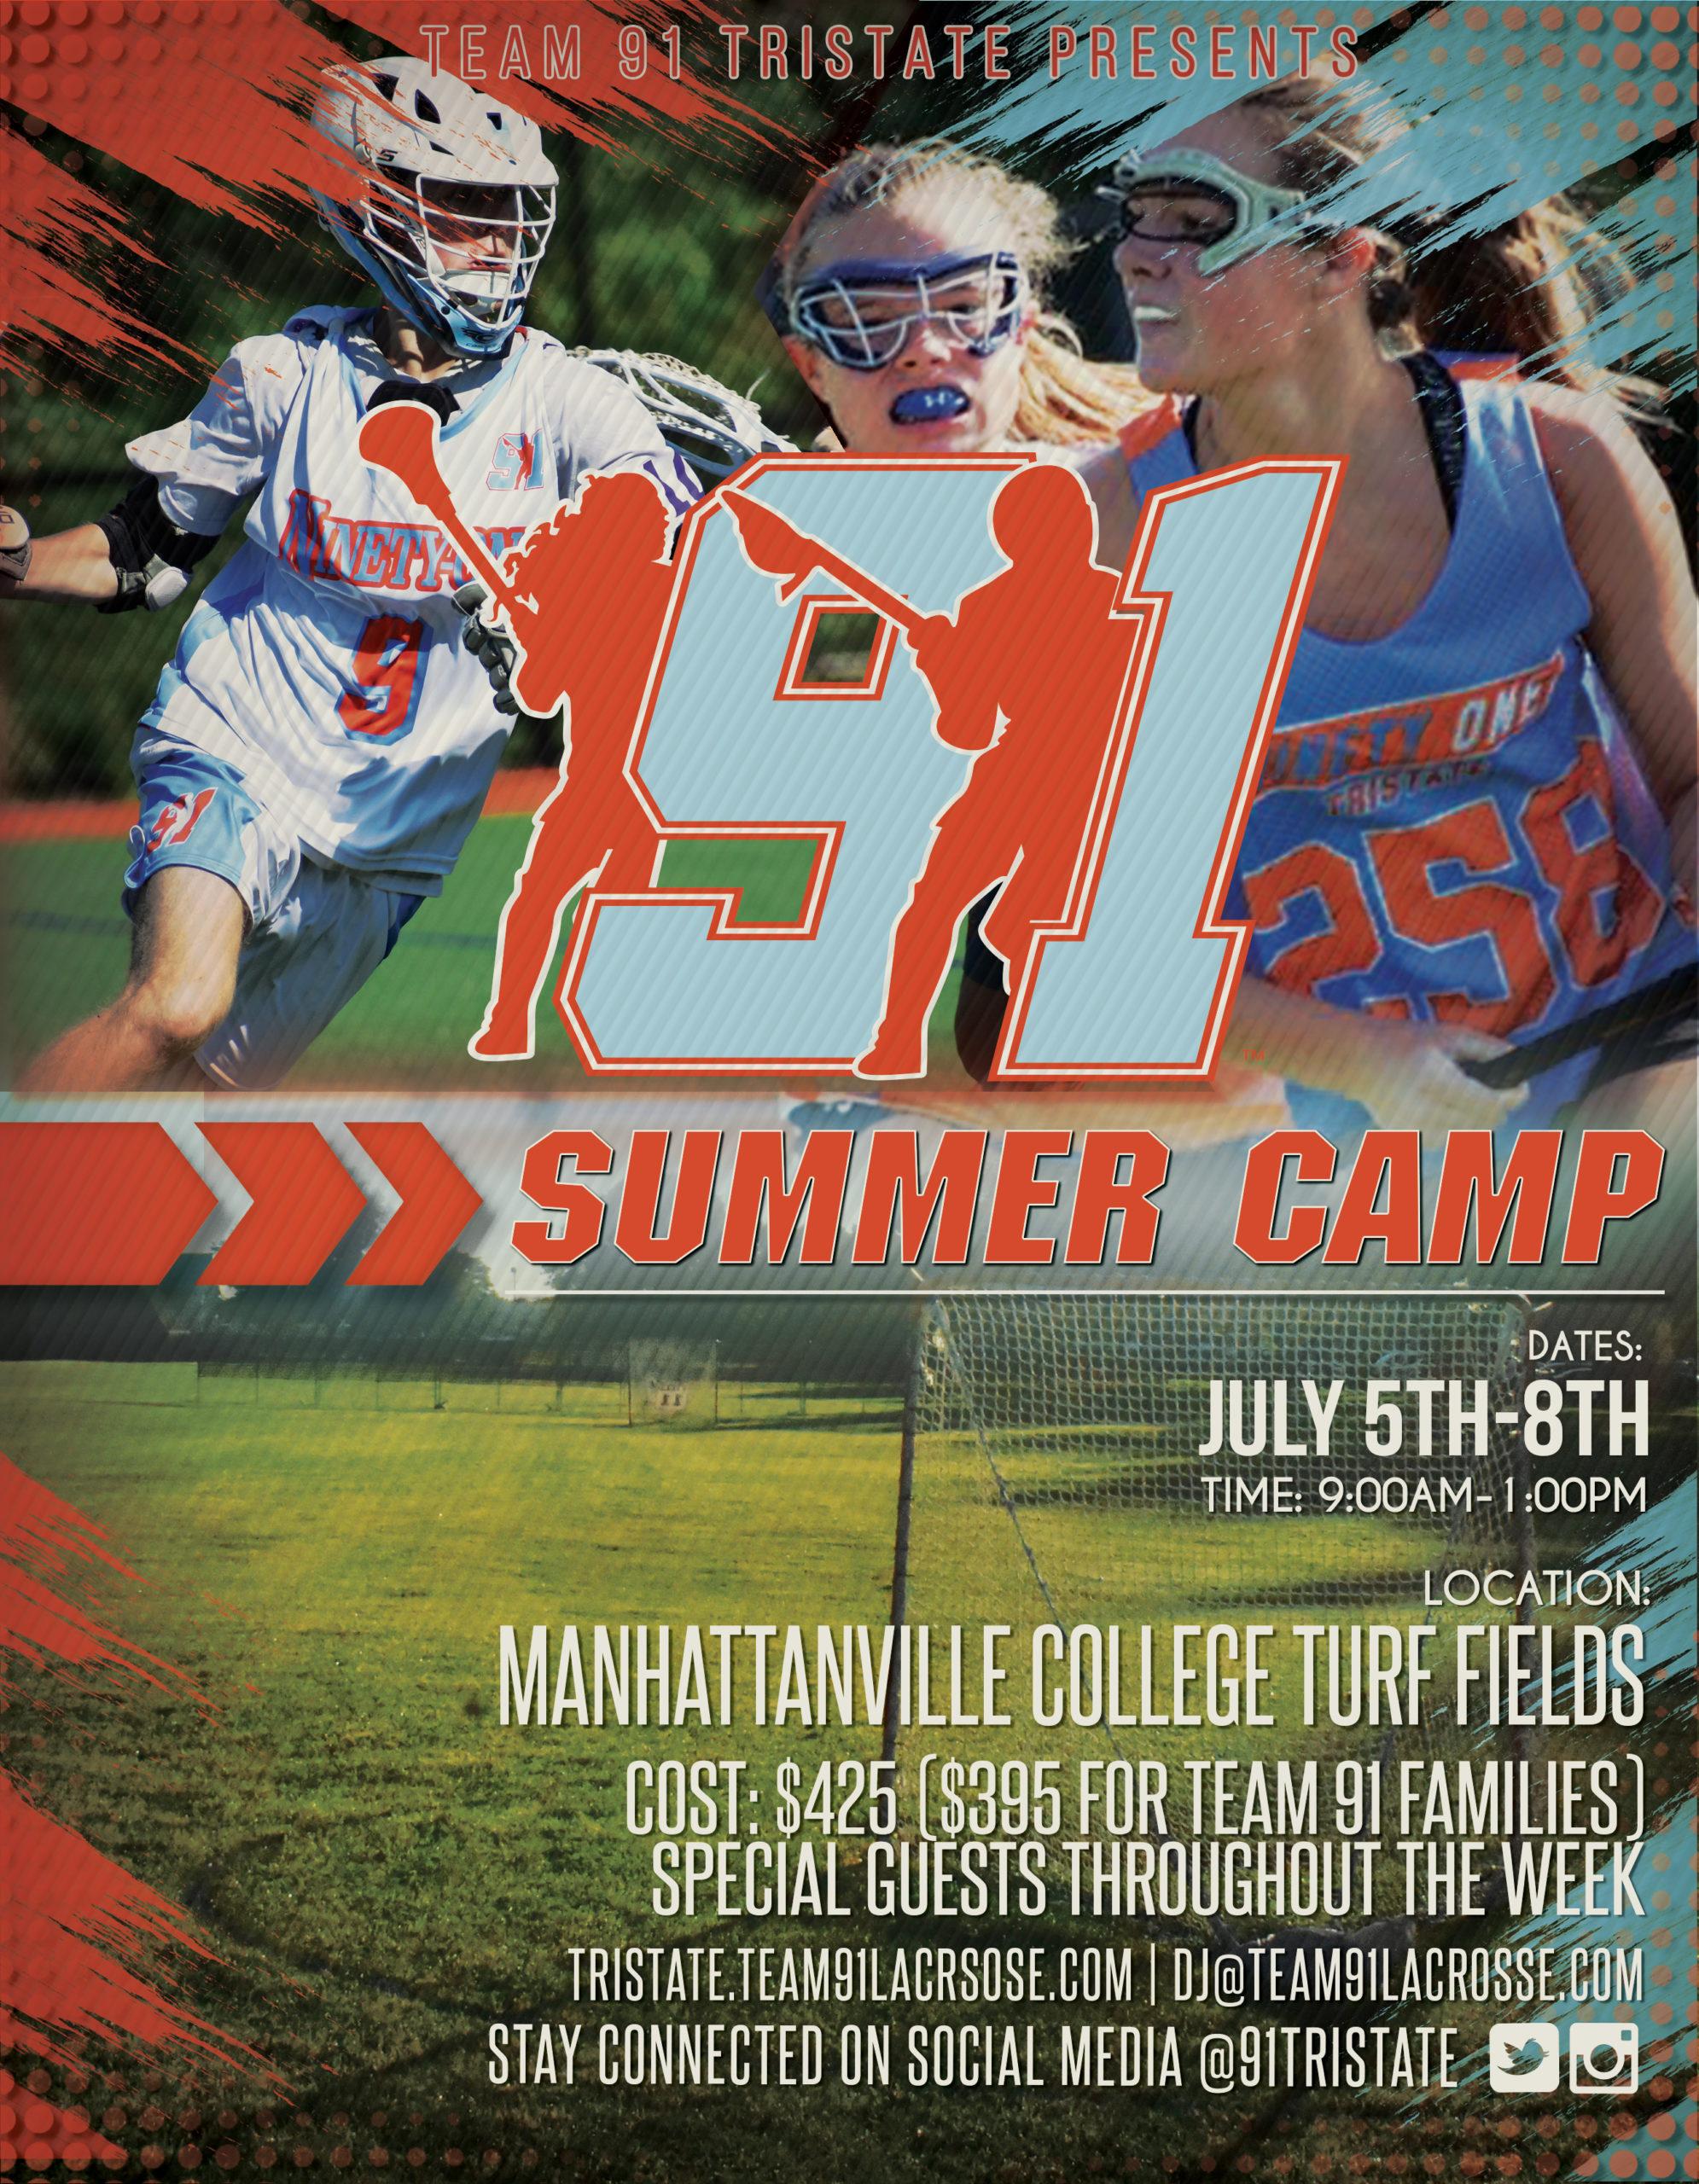 91 camp flyer copy